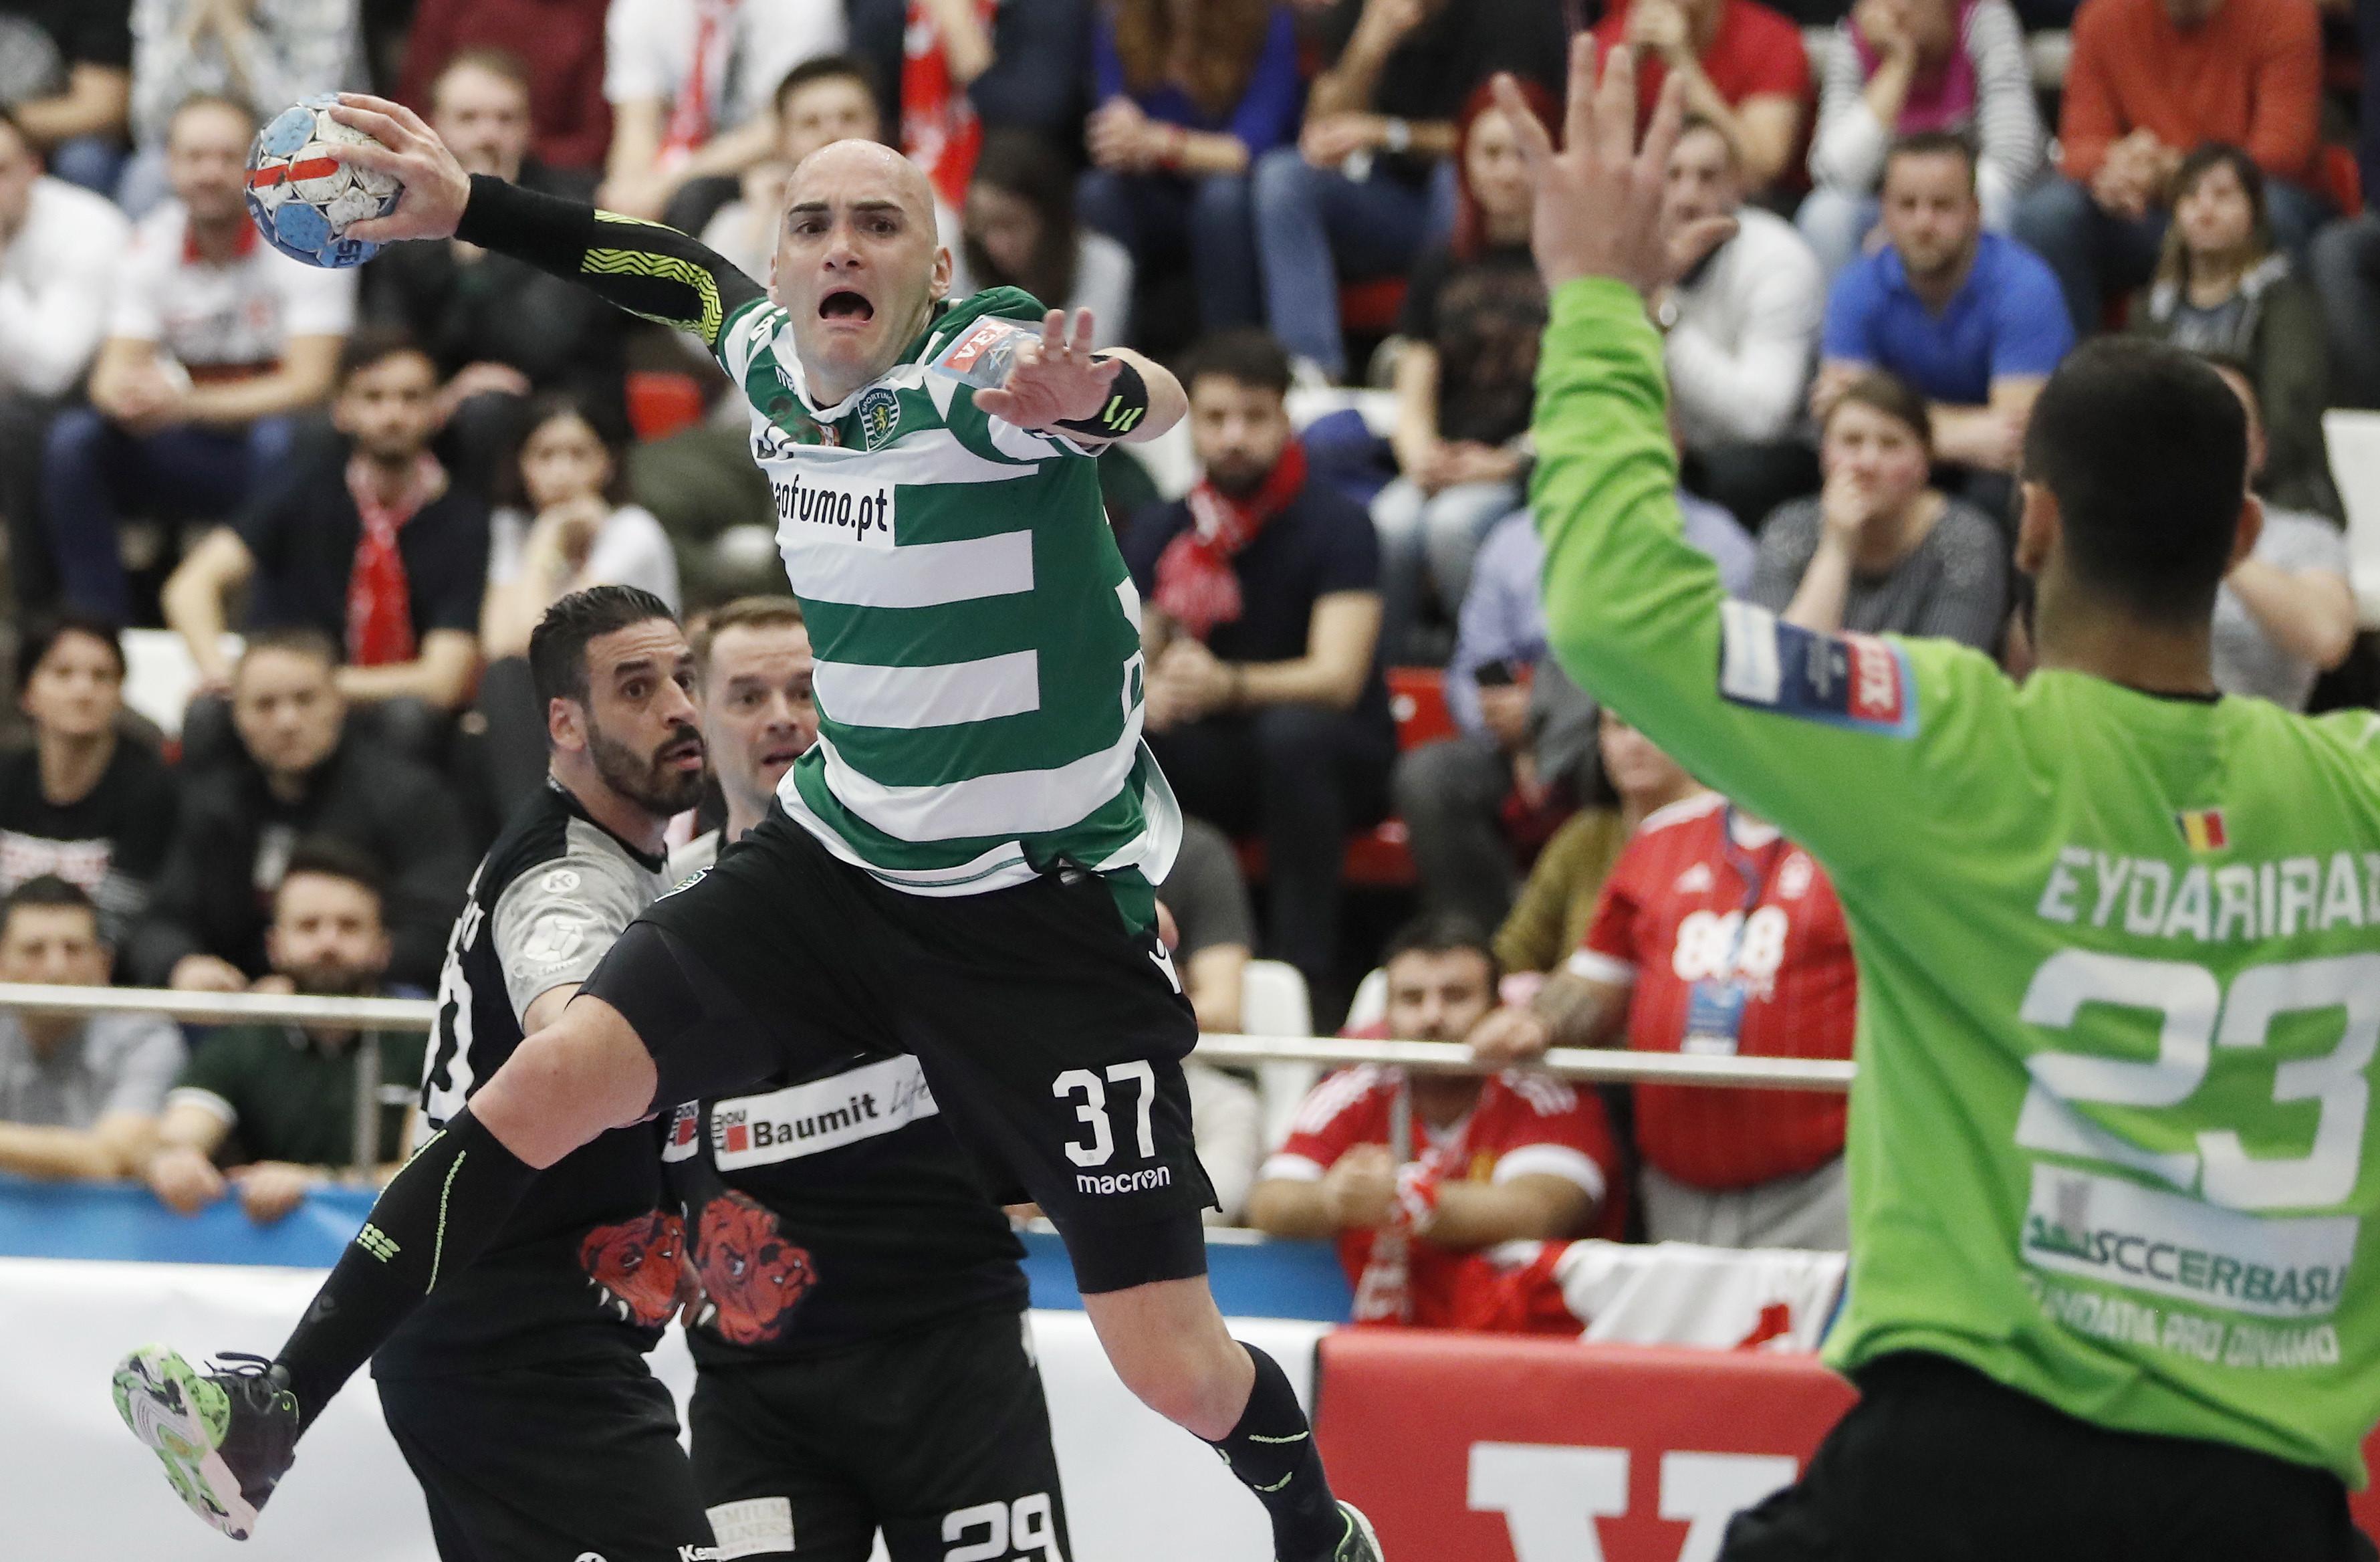 Ivan Nikcevic renova contrato com o Sporting